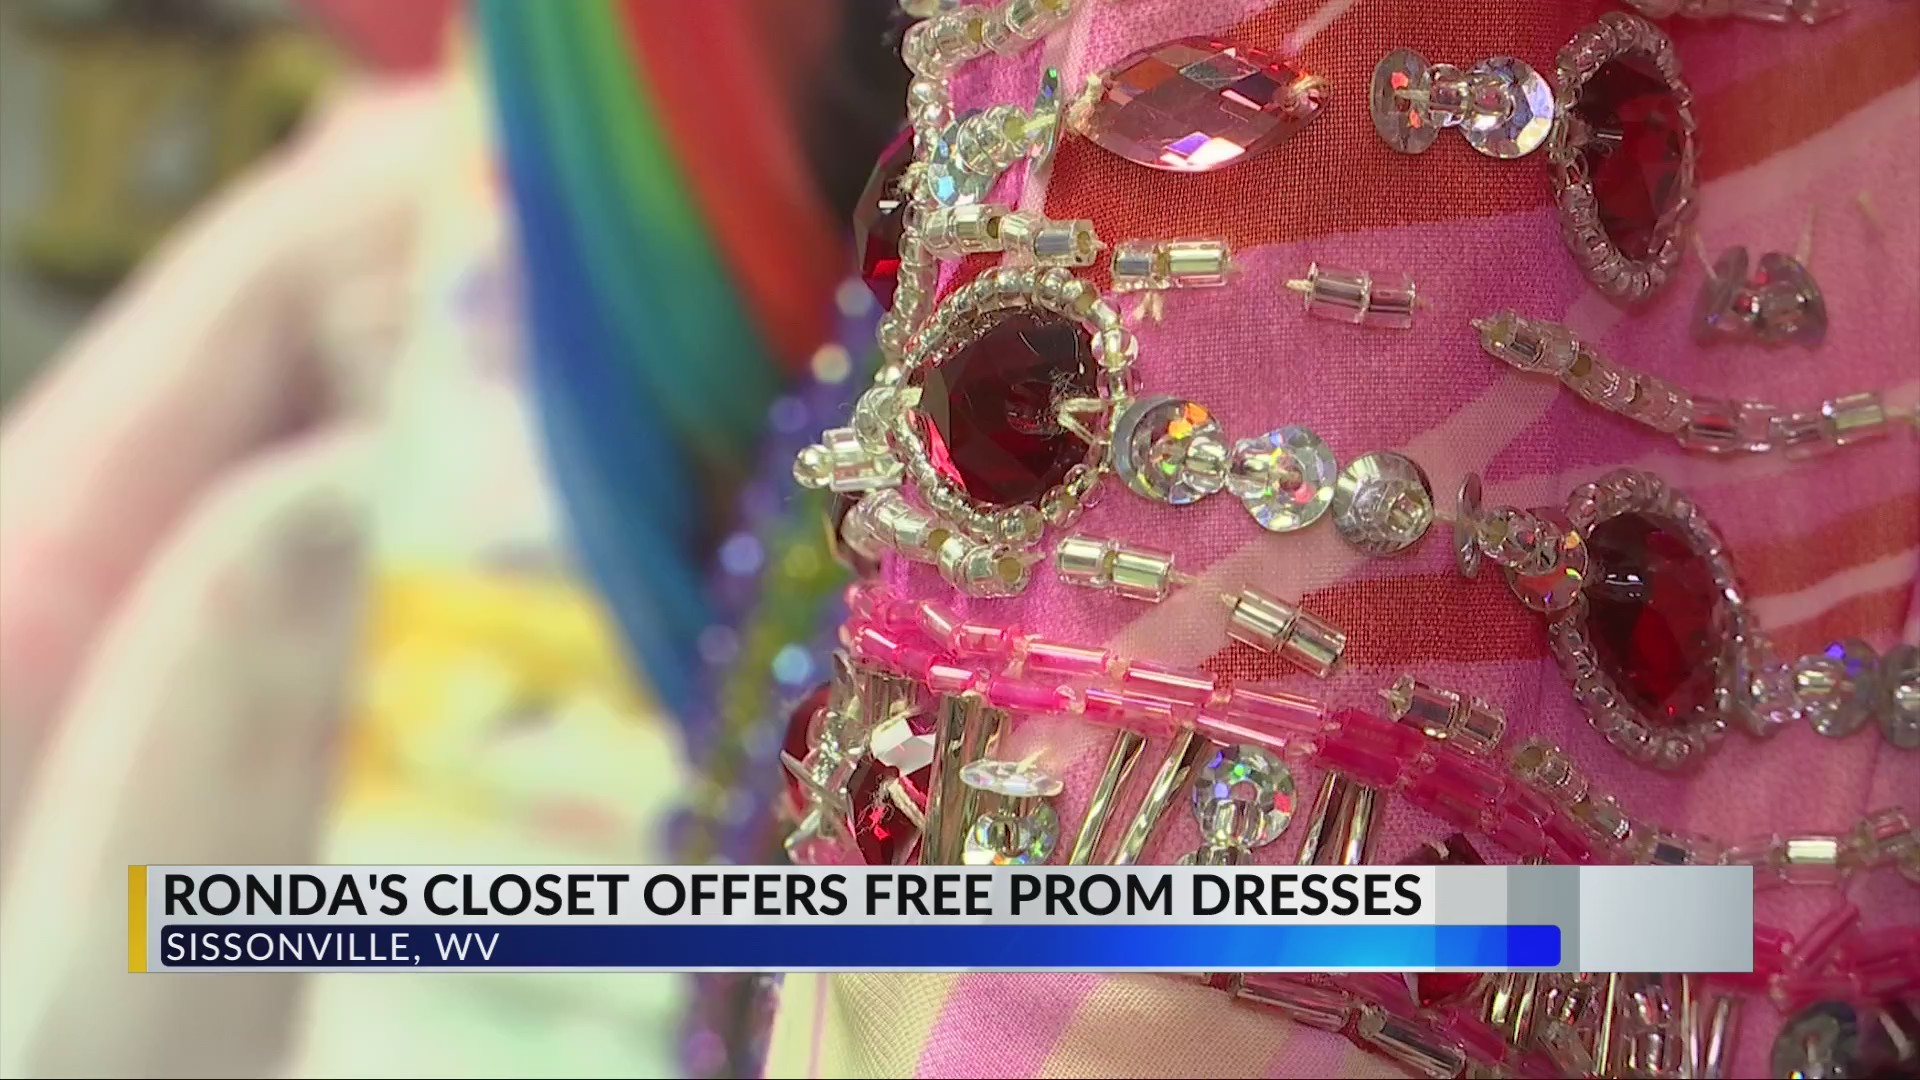 Ronda's Closet Offers Free Prom Dresses for Local Girls